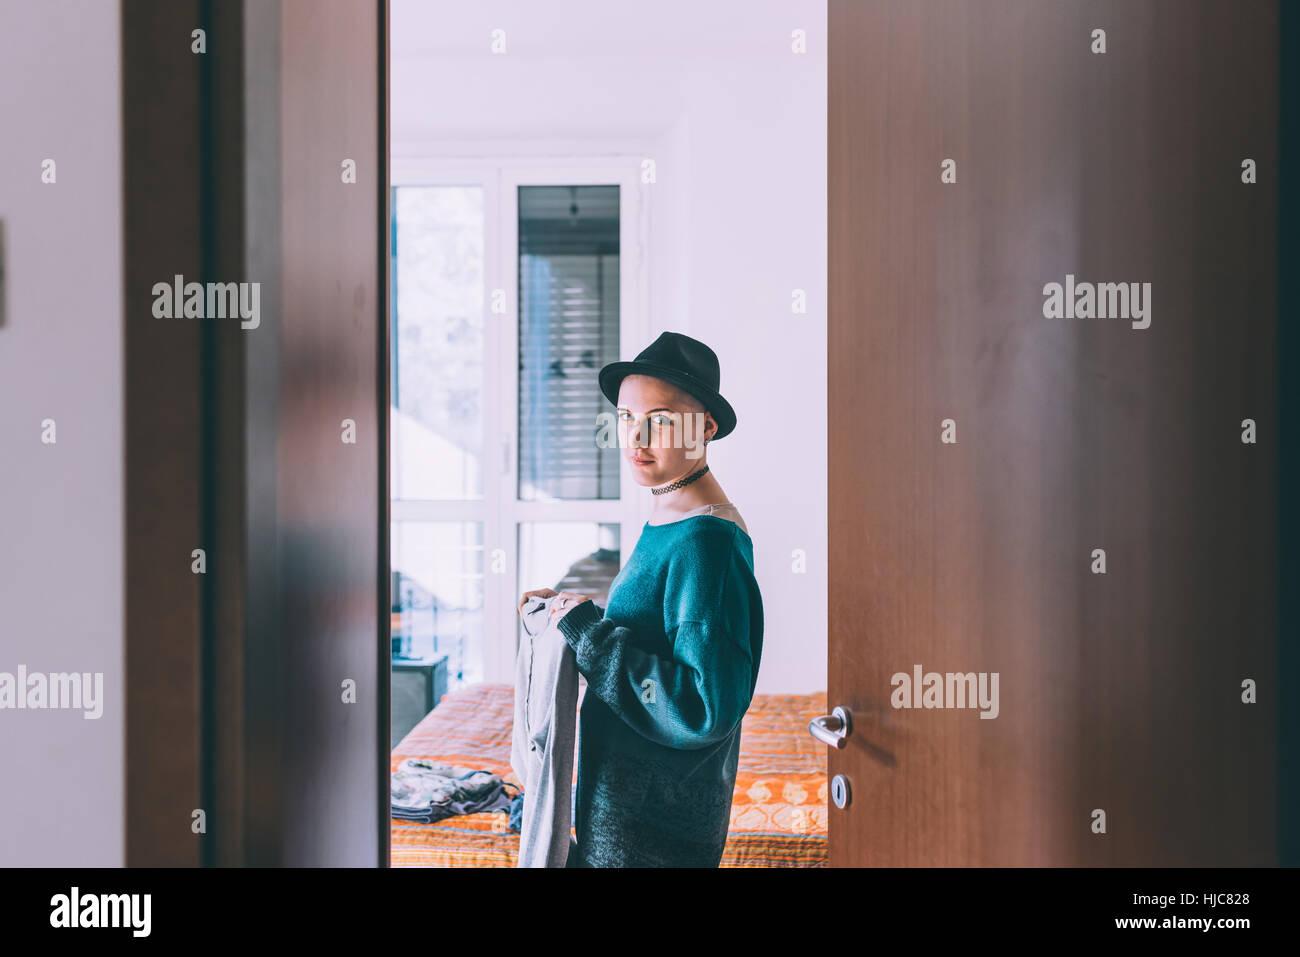 Doorway portrait of young woman wearing trilby standing in bedroom Stock Photo